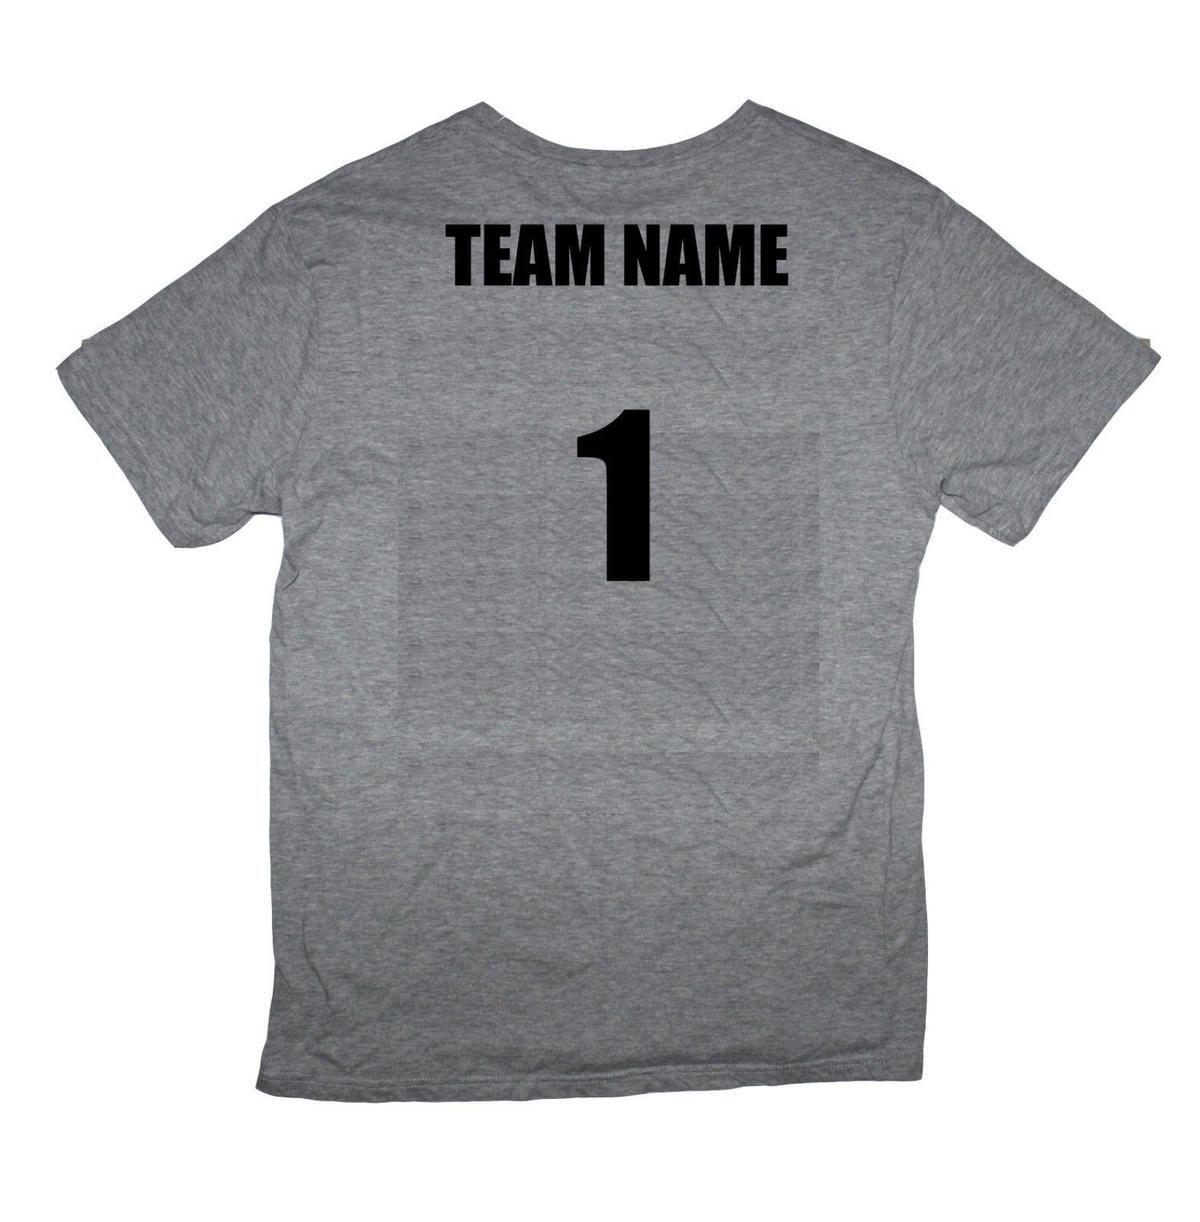 Soccer Team Training Shirts Set 15 Team Name Number 17 Sizes Kids